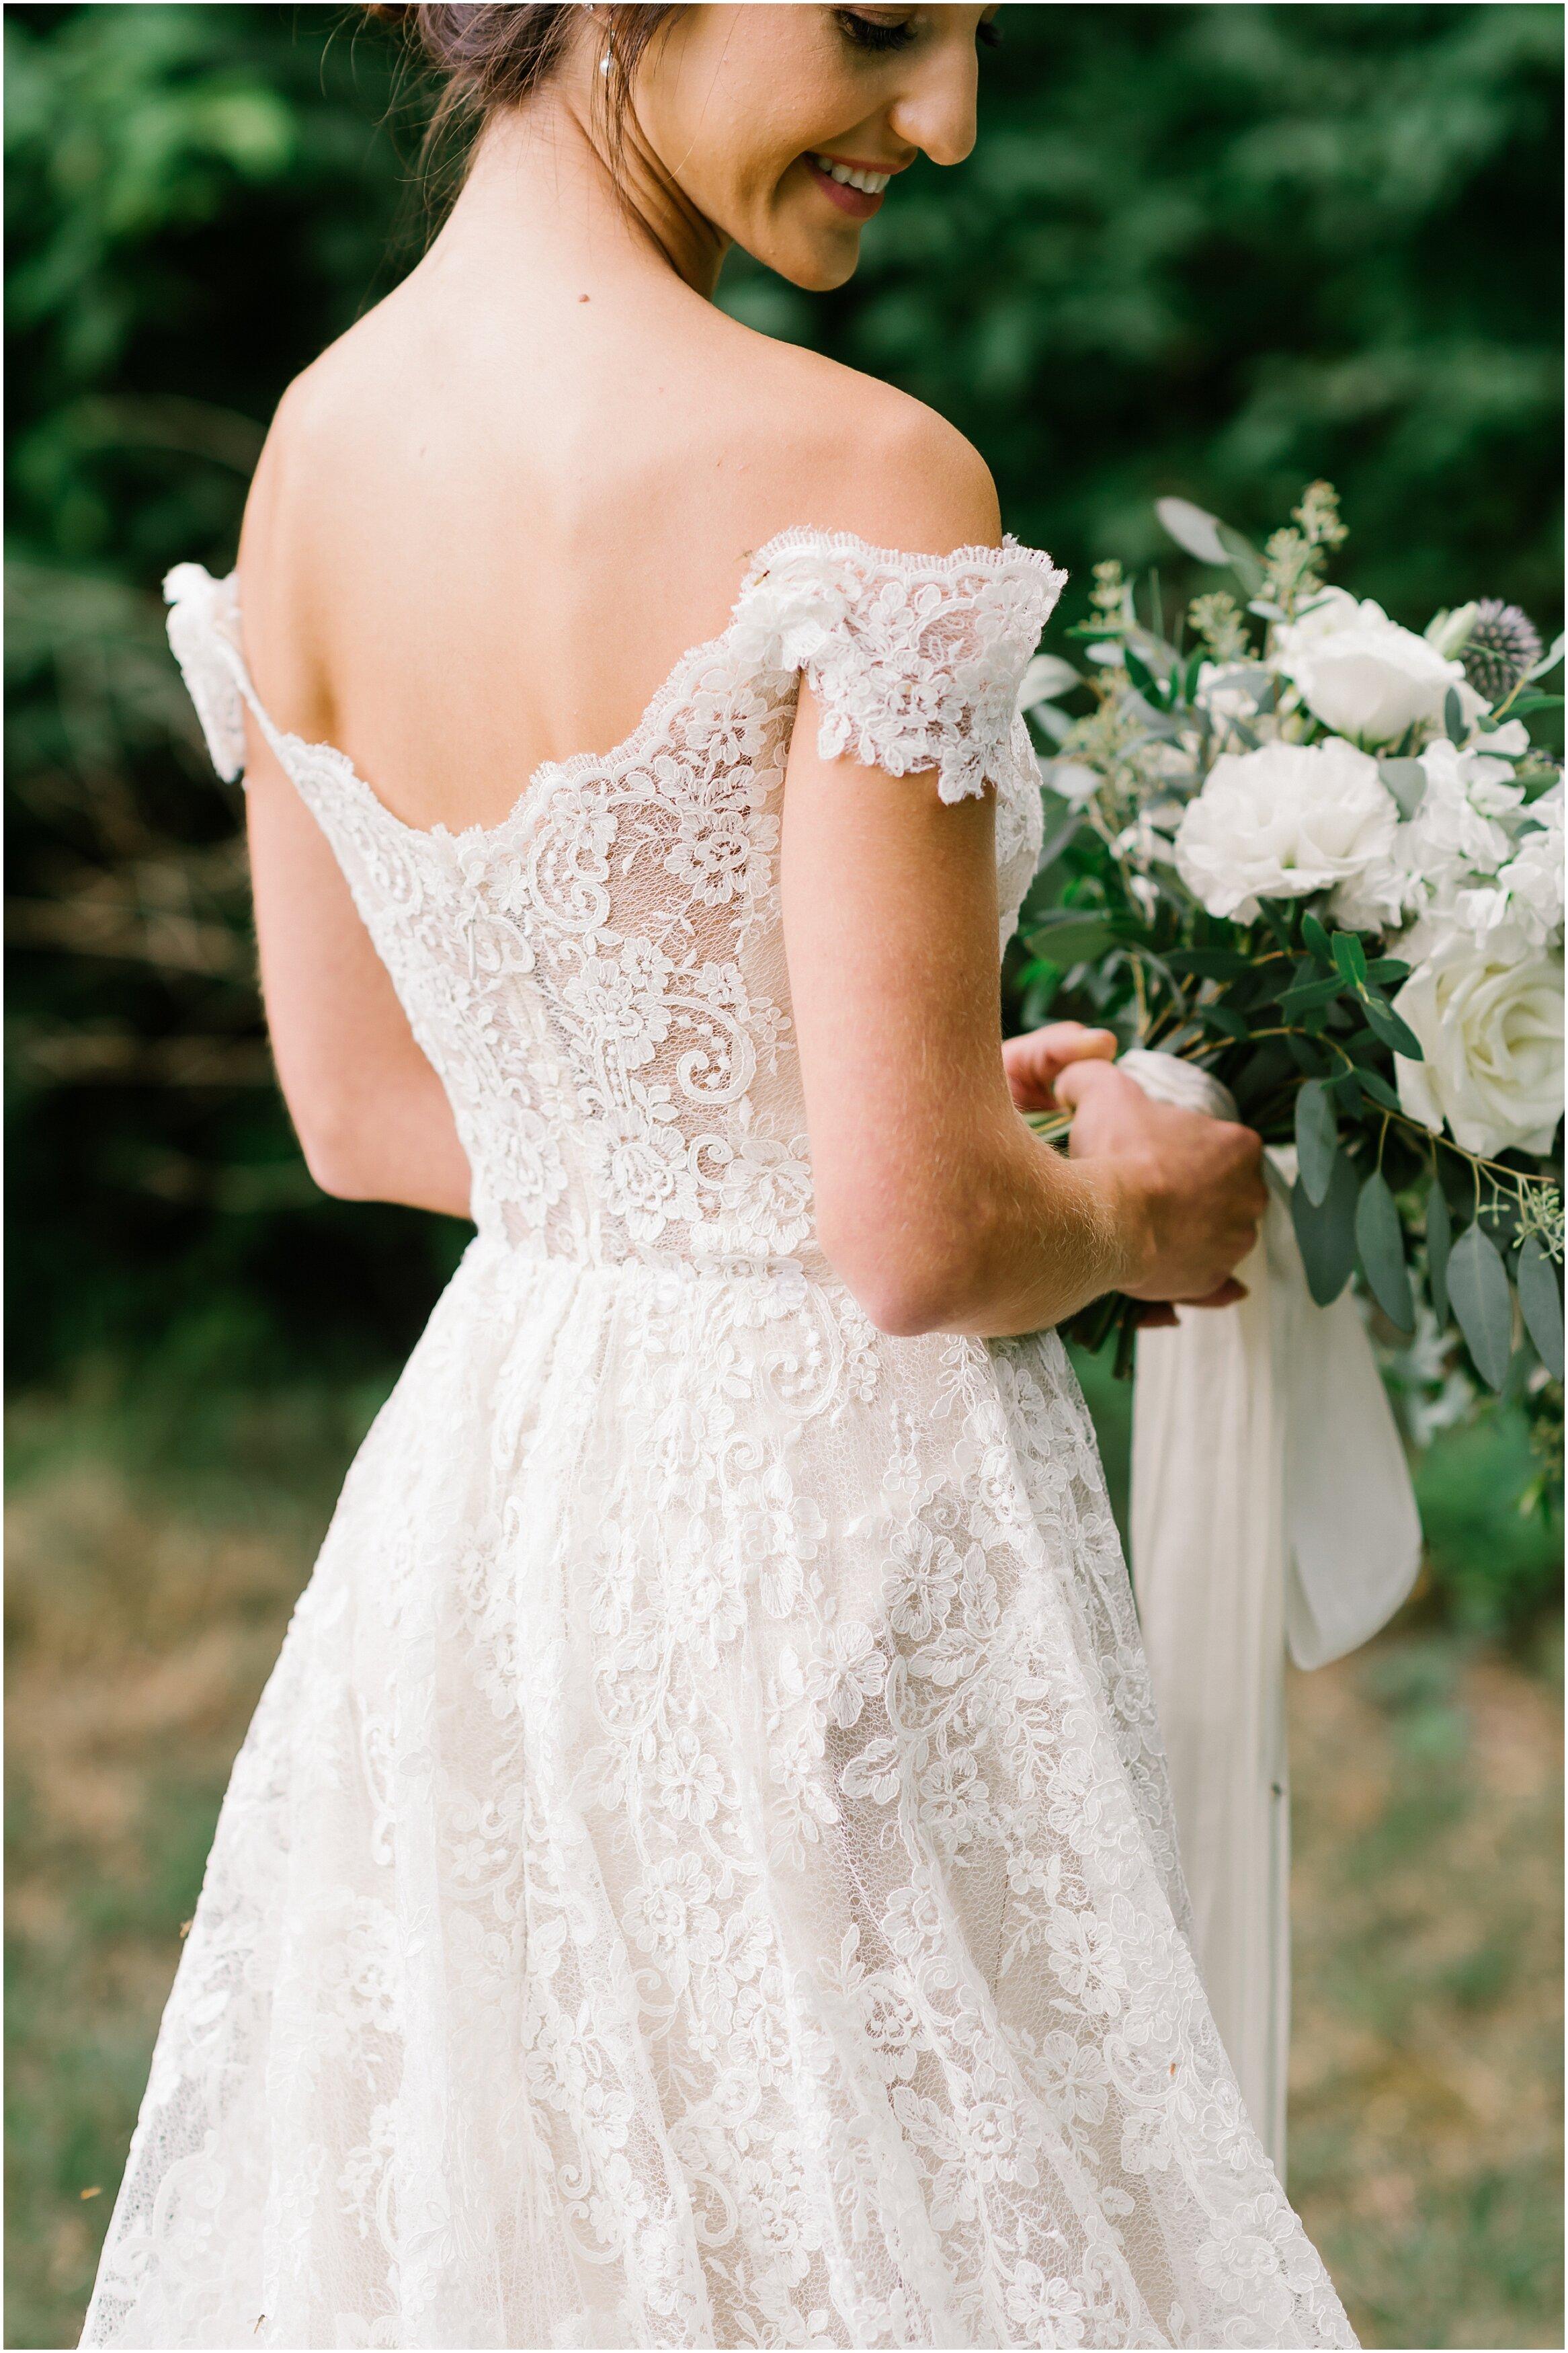 Rebecca Shehorn Photography Indianapolis Wedding Photographer Sycamore at Mallow Run_0723.jpg